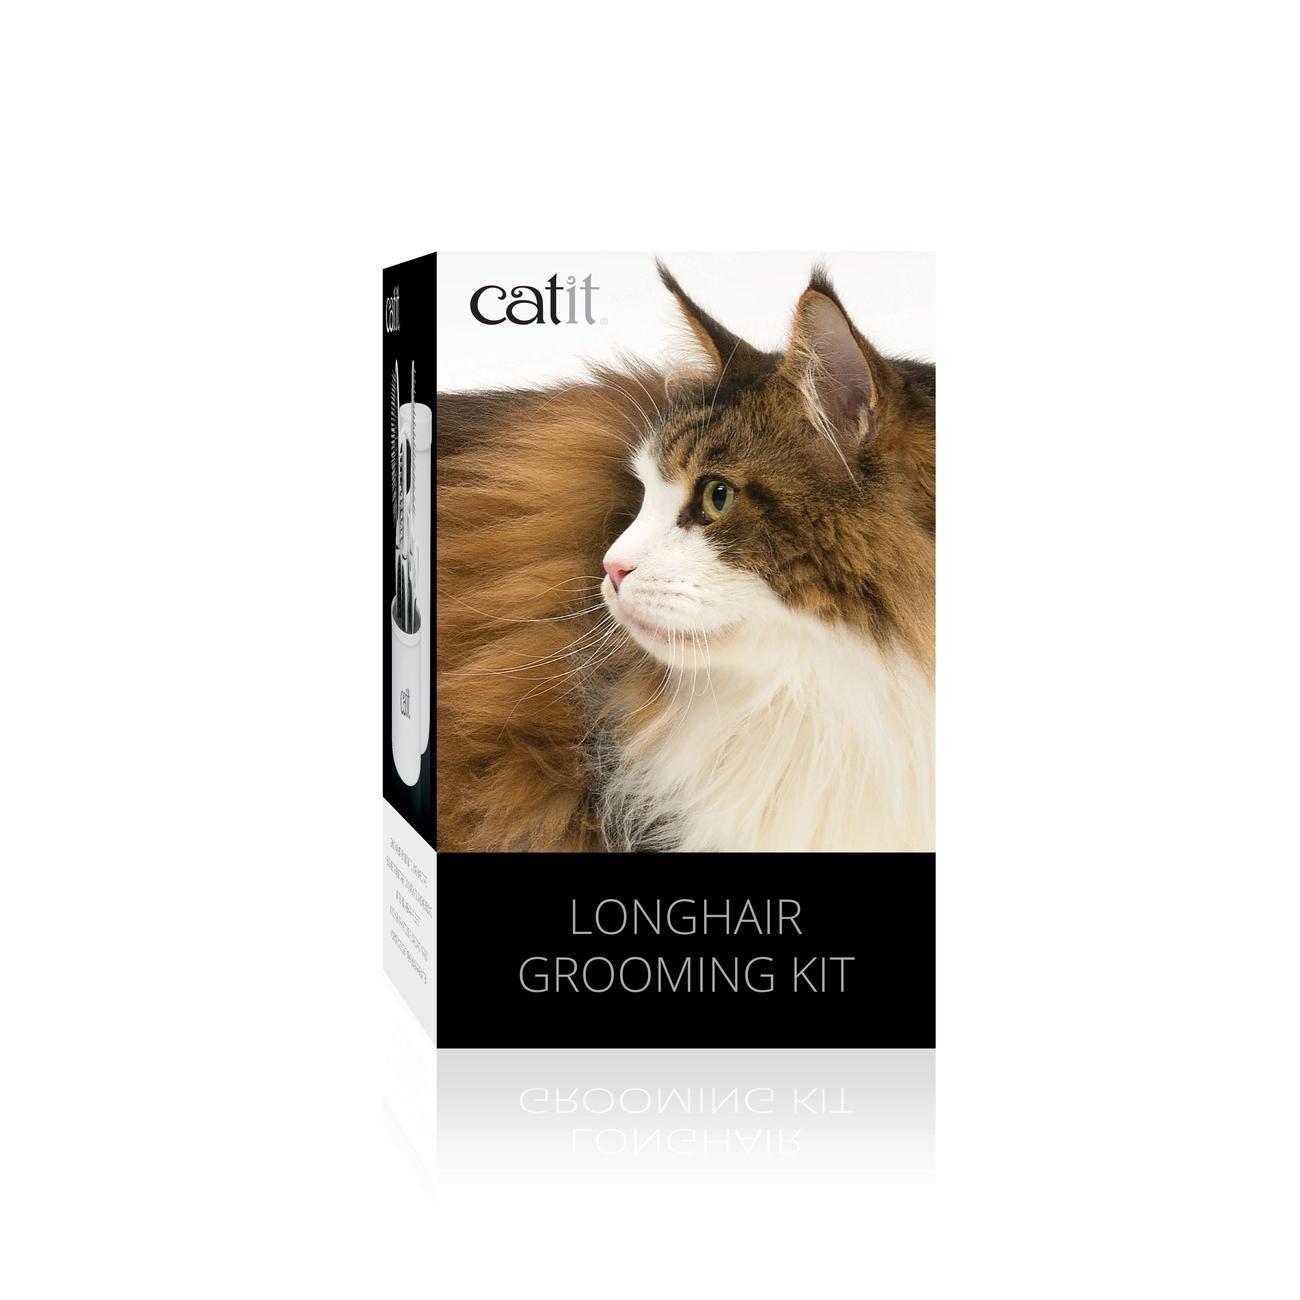 Catit Grooming Kit - Bürsten-Set für Katzen, Bild 3